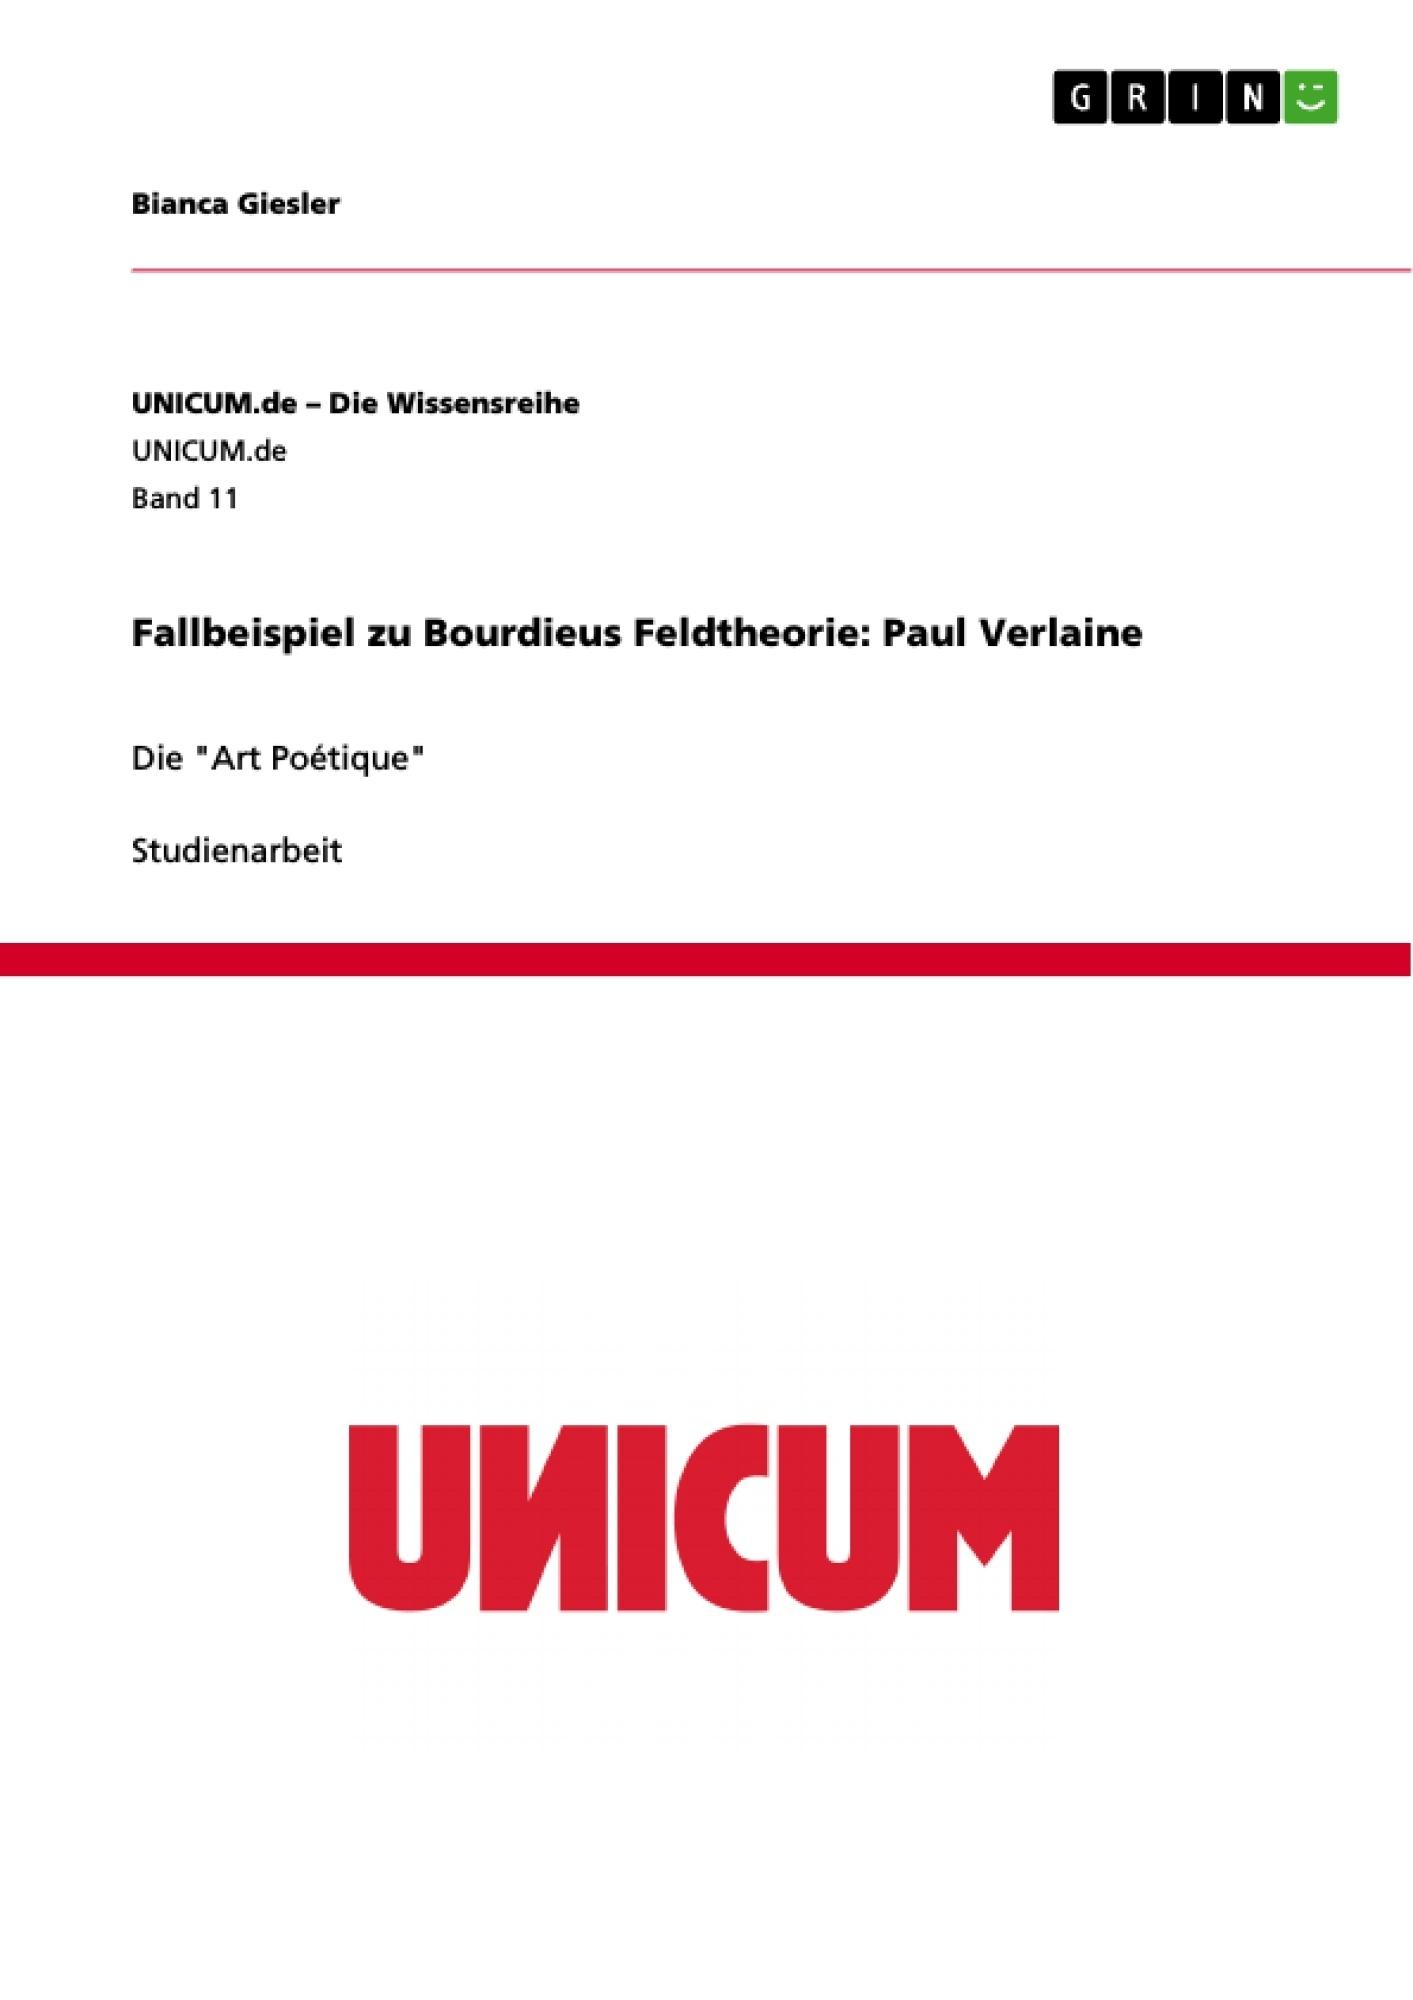 Titel: Fallbeispiel zu Bourdieus Feldtheorie: Paul Verlaine